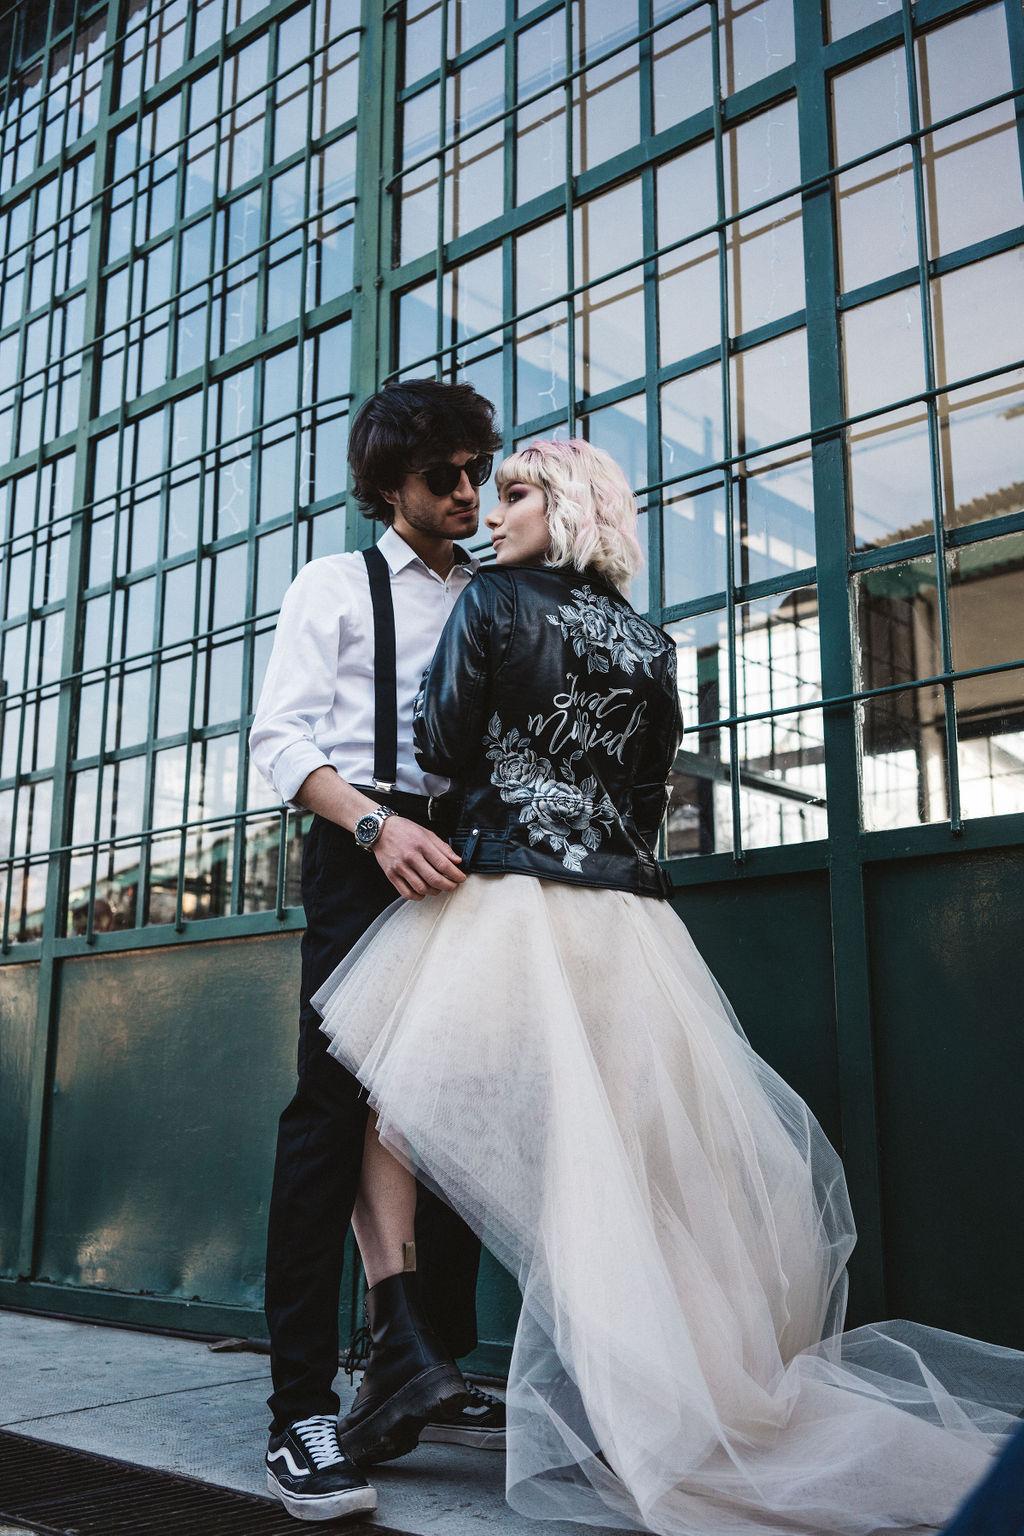 hand painted leather jacket - high low wedding dress - modern industrial wedding - alternative wedding - unconventional wedding - edgy wedding - rock and roll wedding